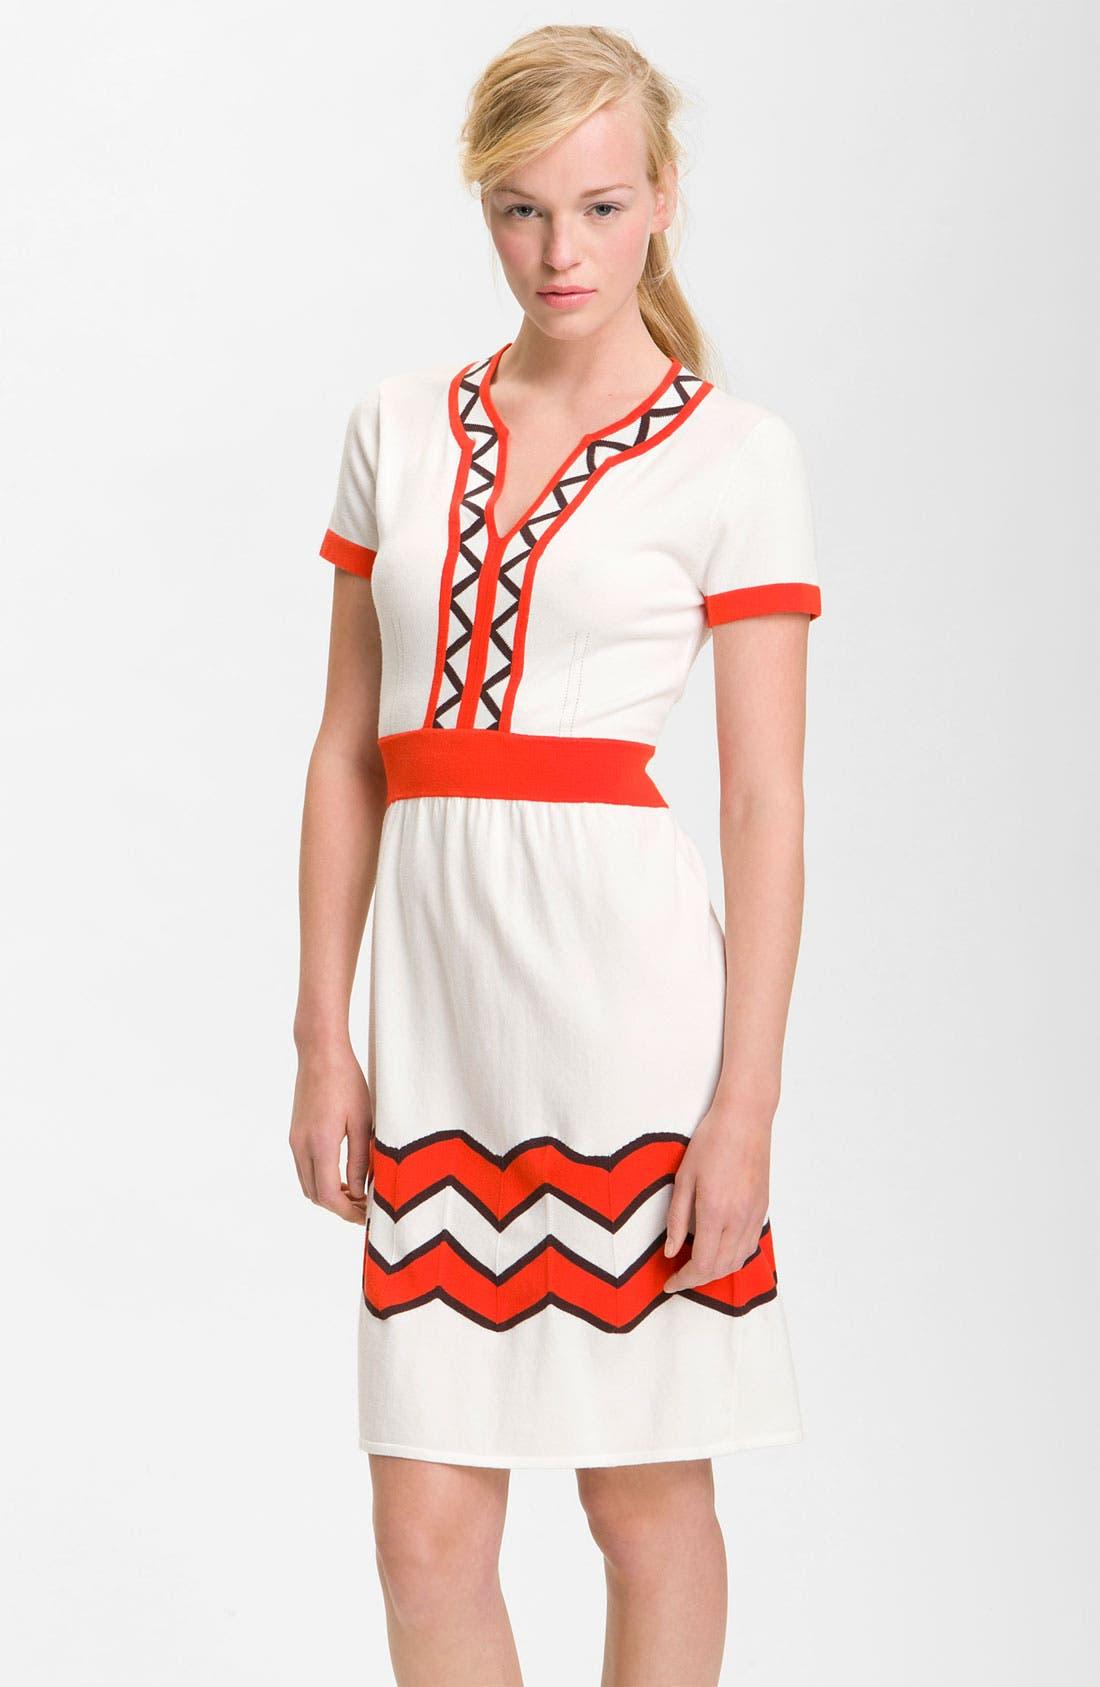 Alternate Image 1 Selected - Milly 'Belle' Knit Dress